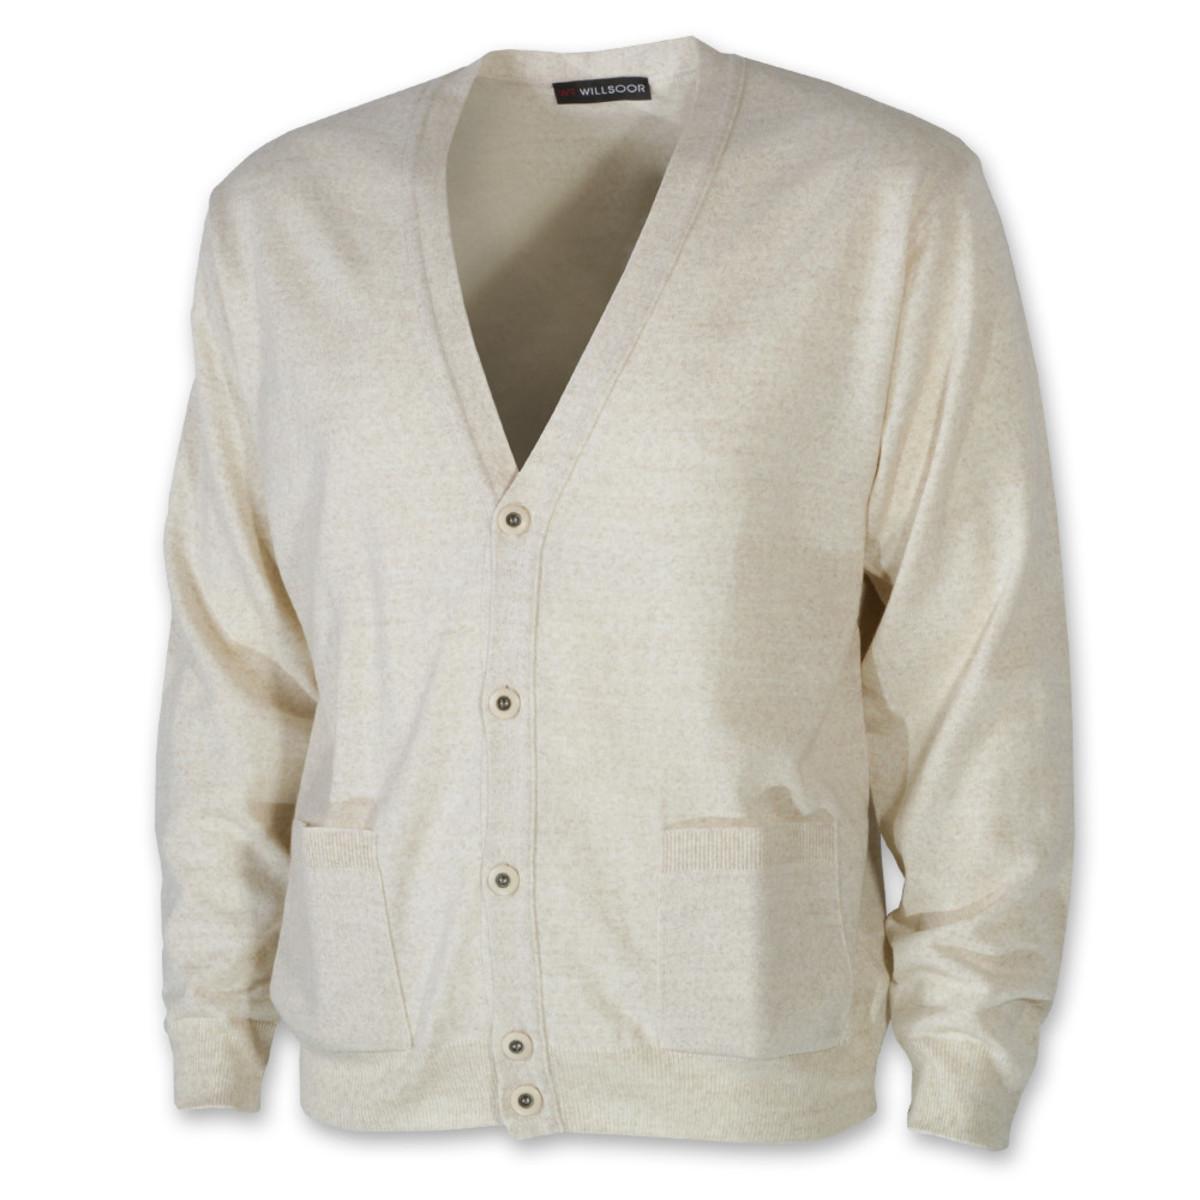 Pánsky sveter cardigan béžový 10276 XL